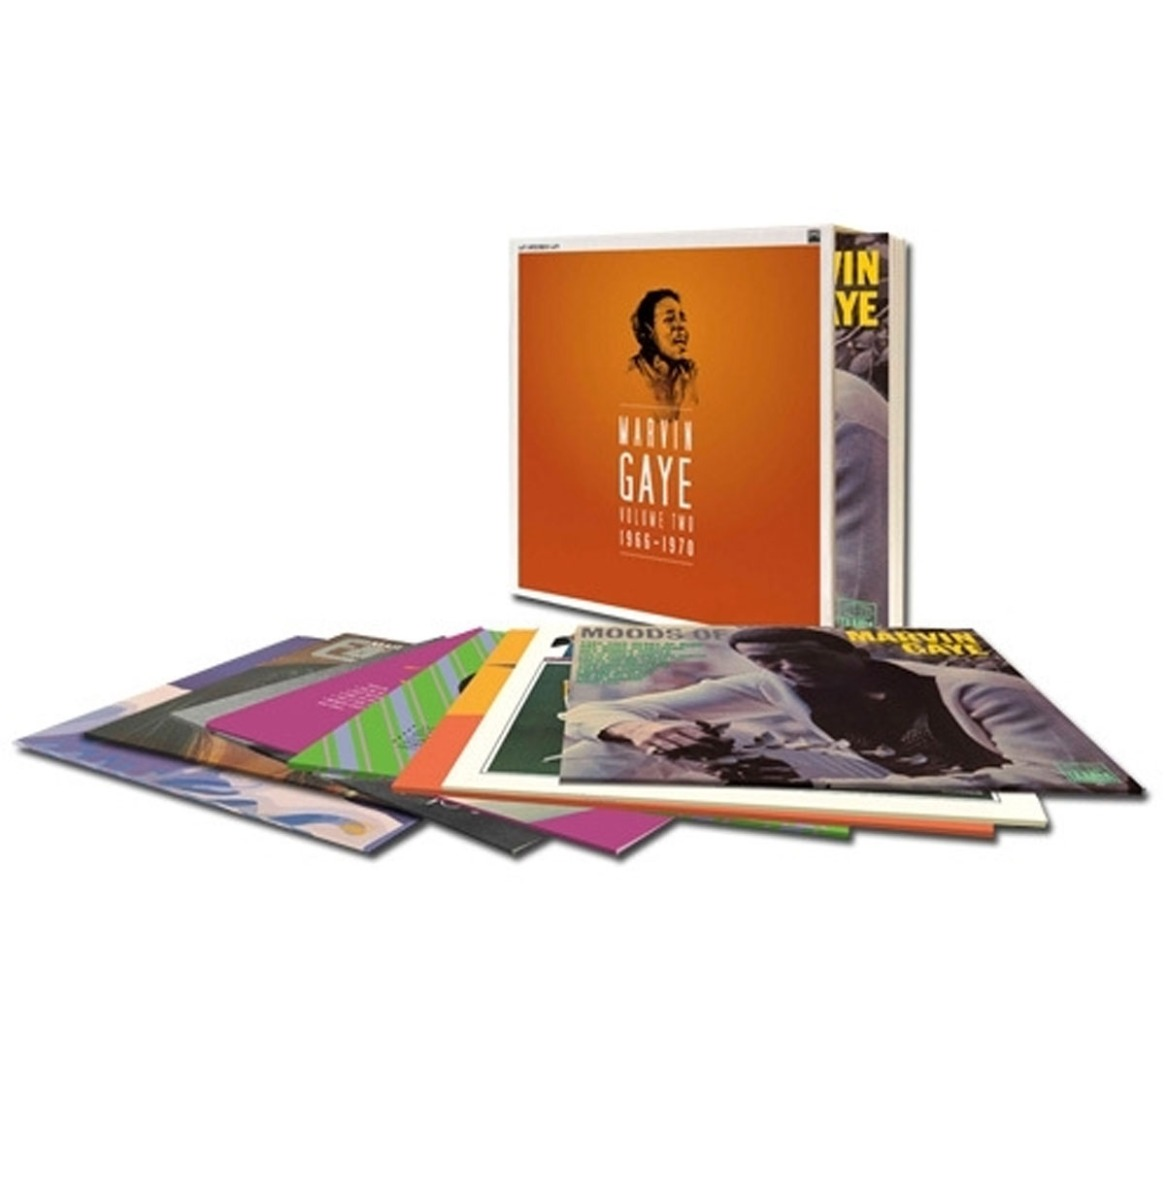 Marvin Gaye - Volume Two 1966-1970 8-LP Box Set - Beperkte Oplage